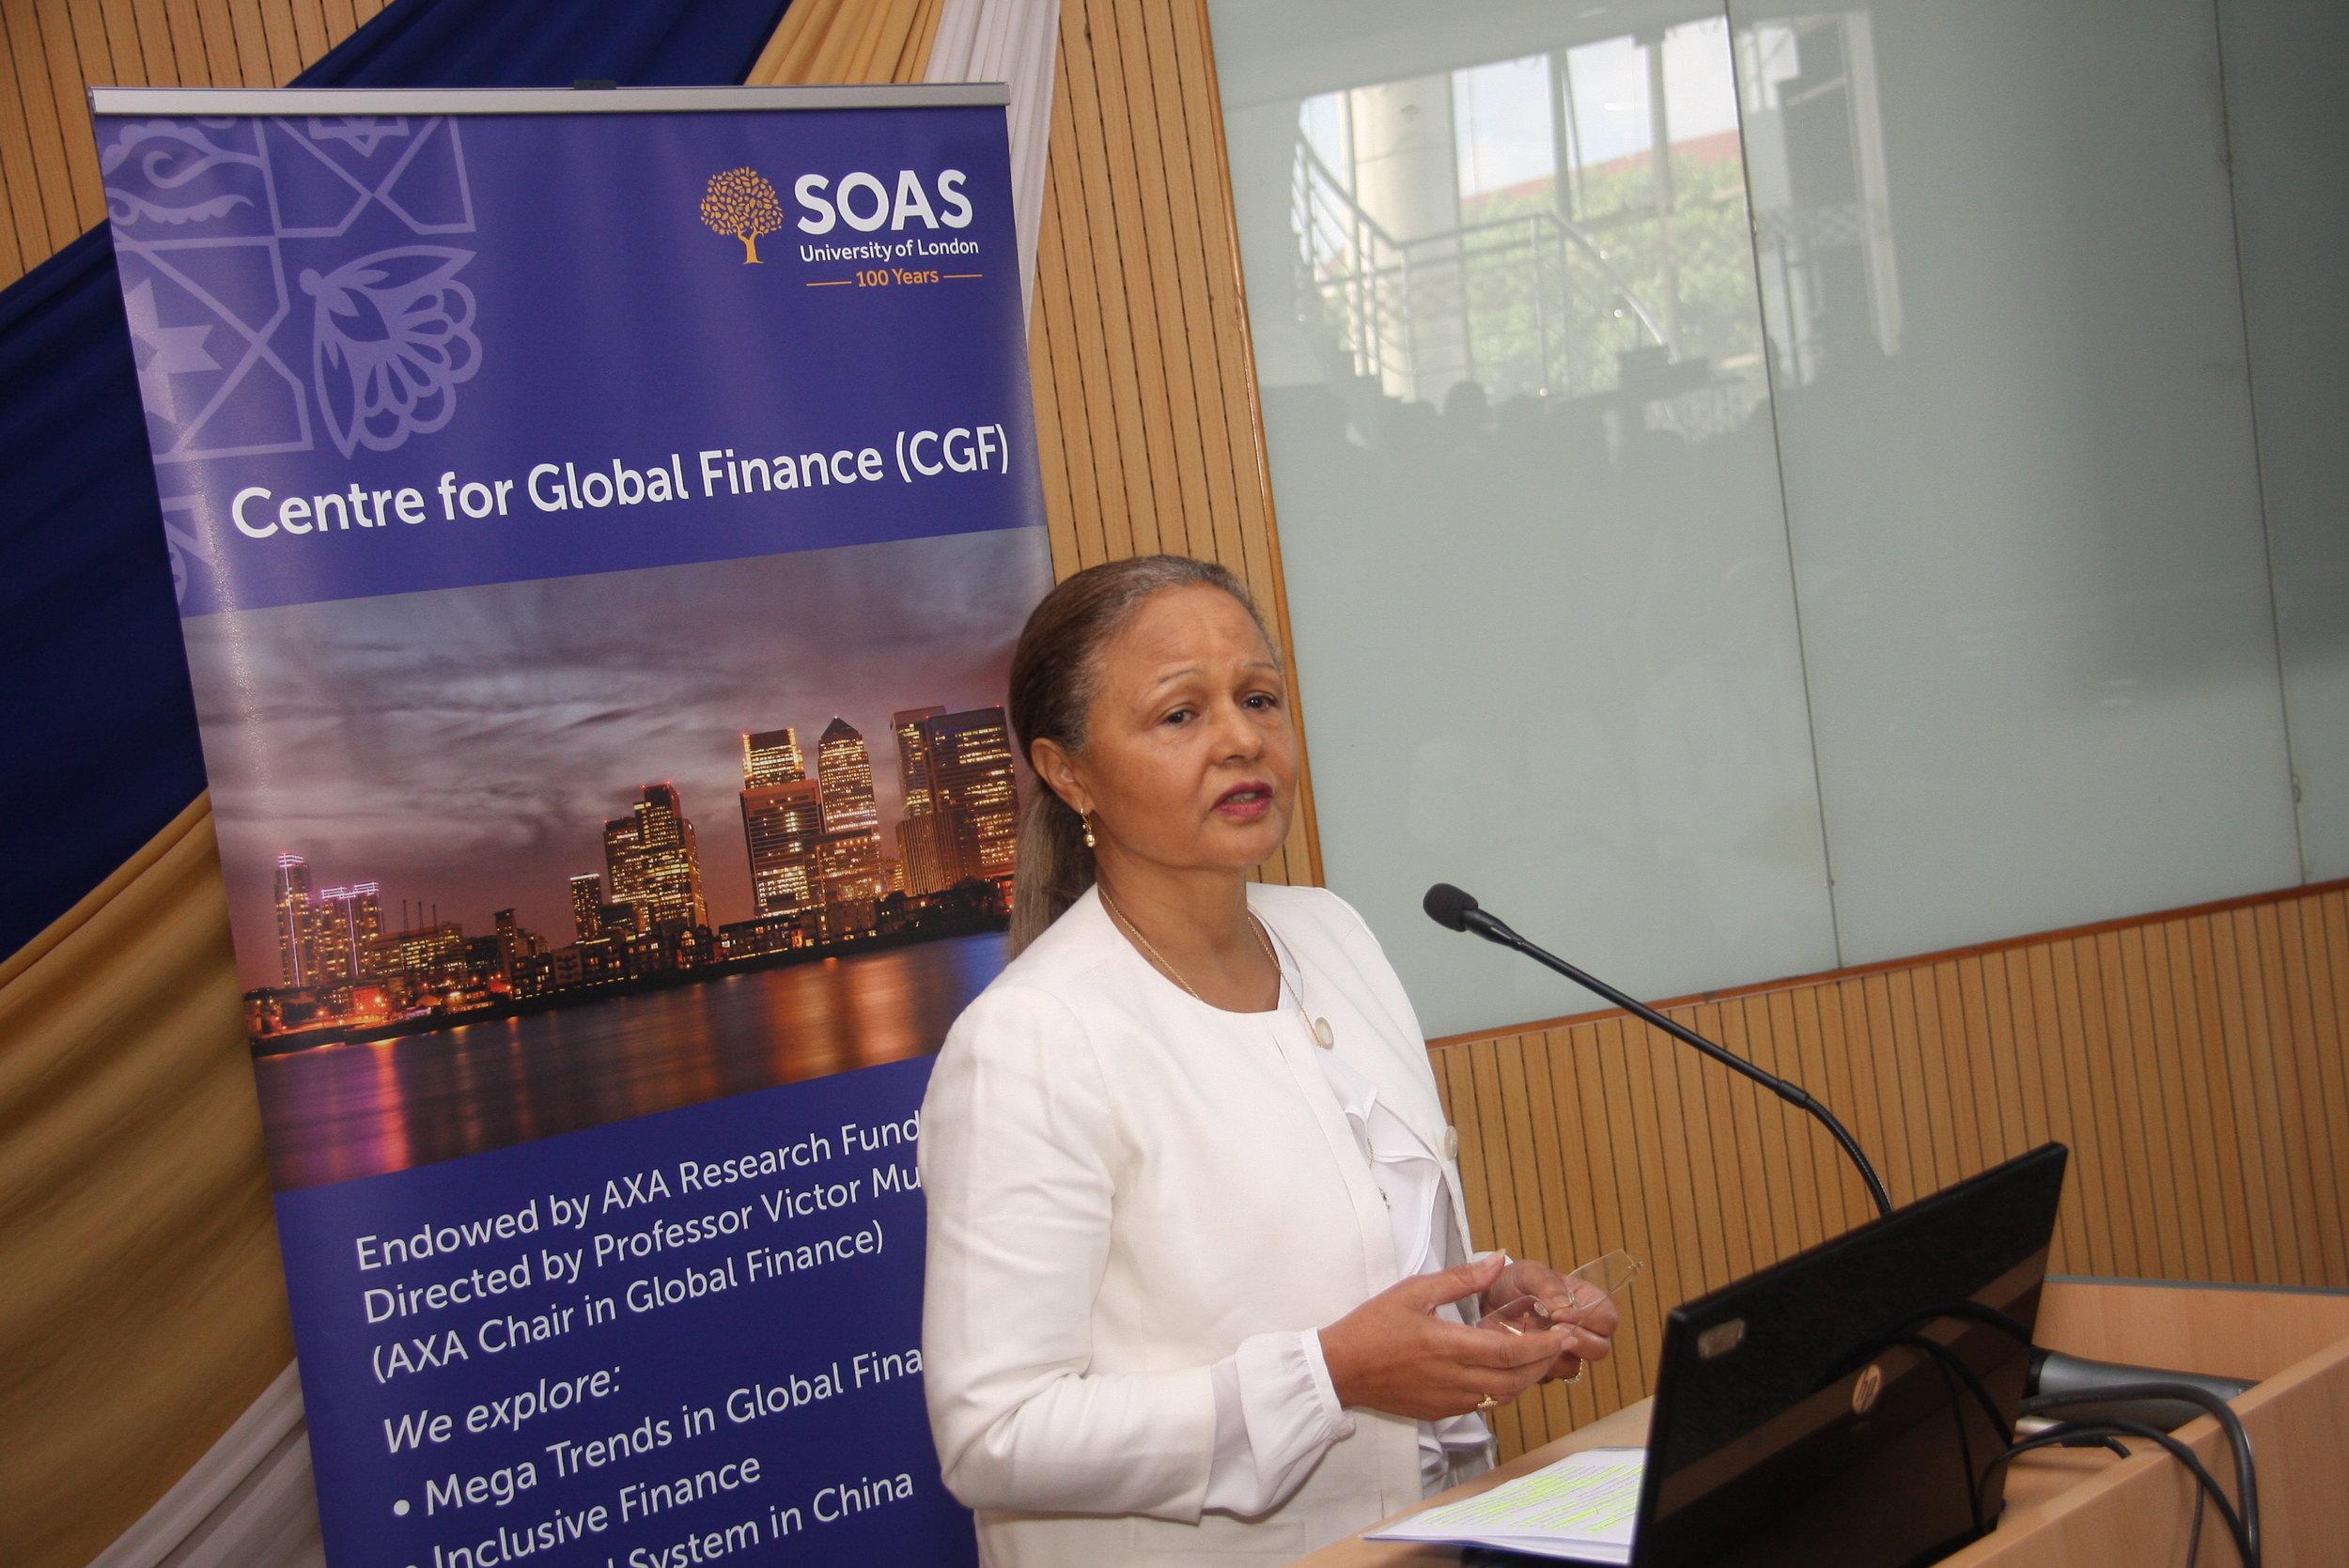 Mrs Sheila M'Mbijjewe, Deputy Governor of CBK